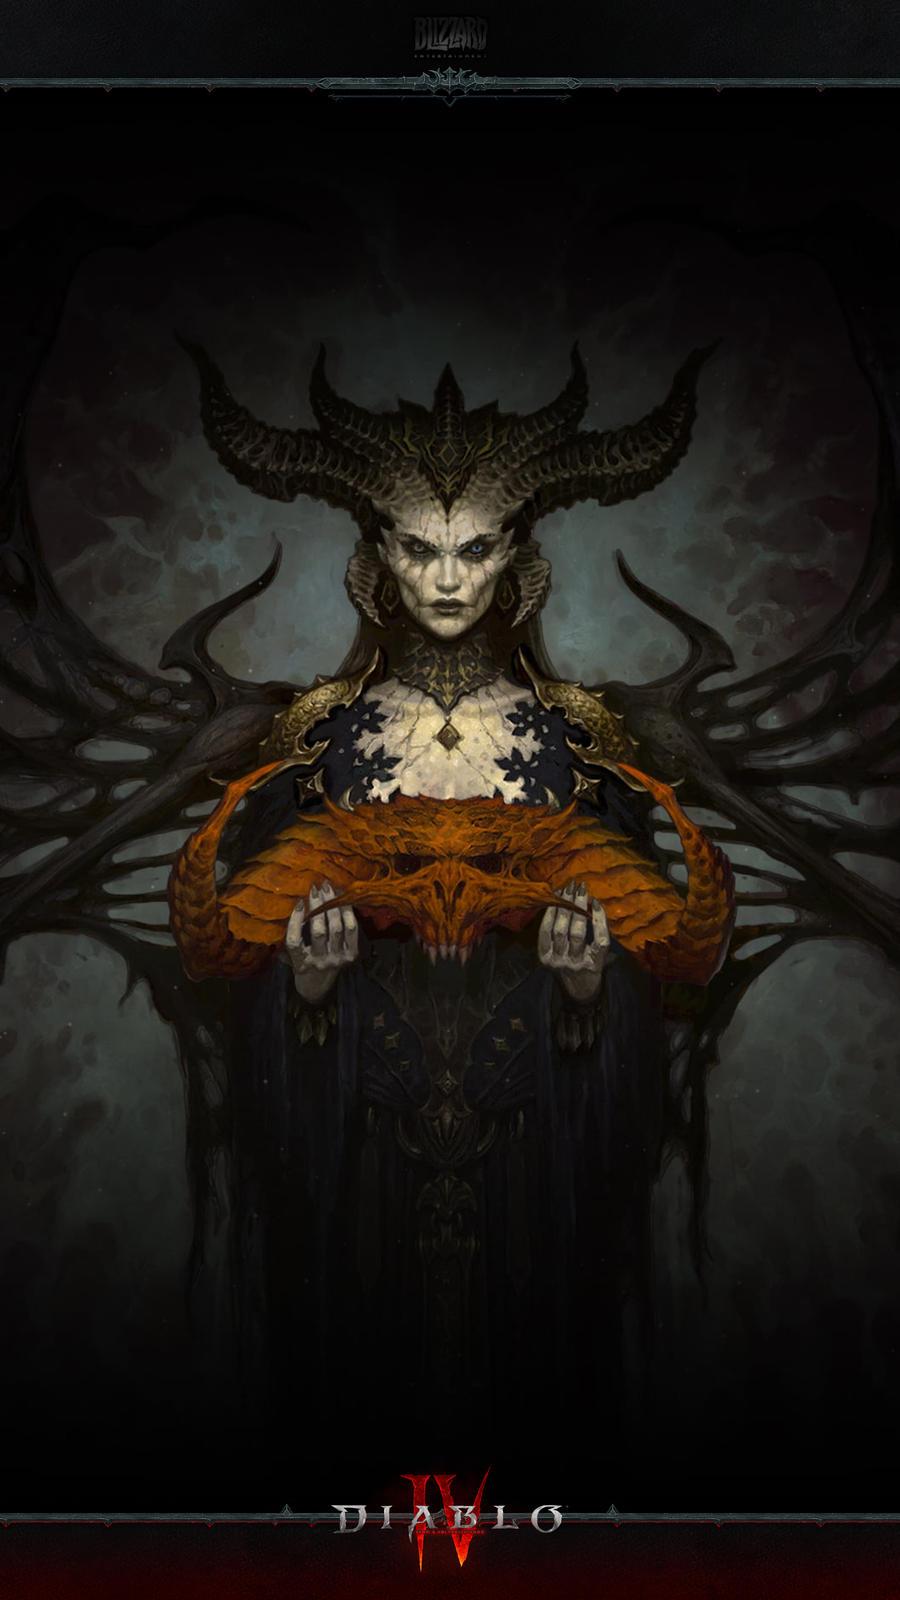 Diablo IV Mobile #1: Lilith